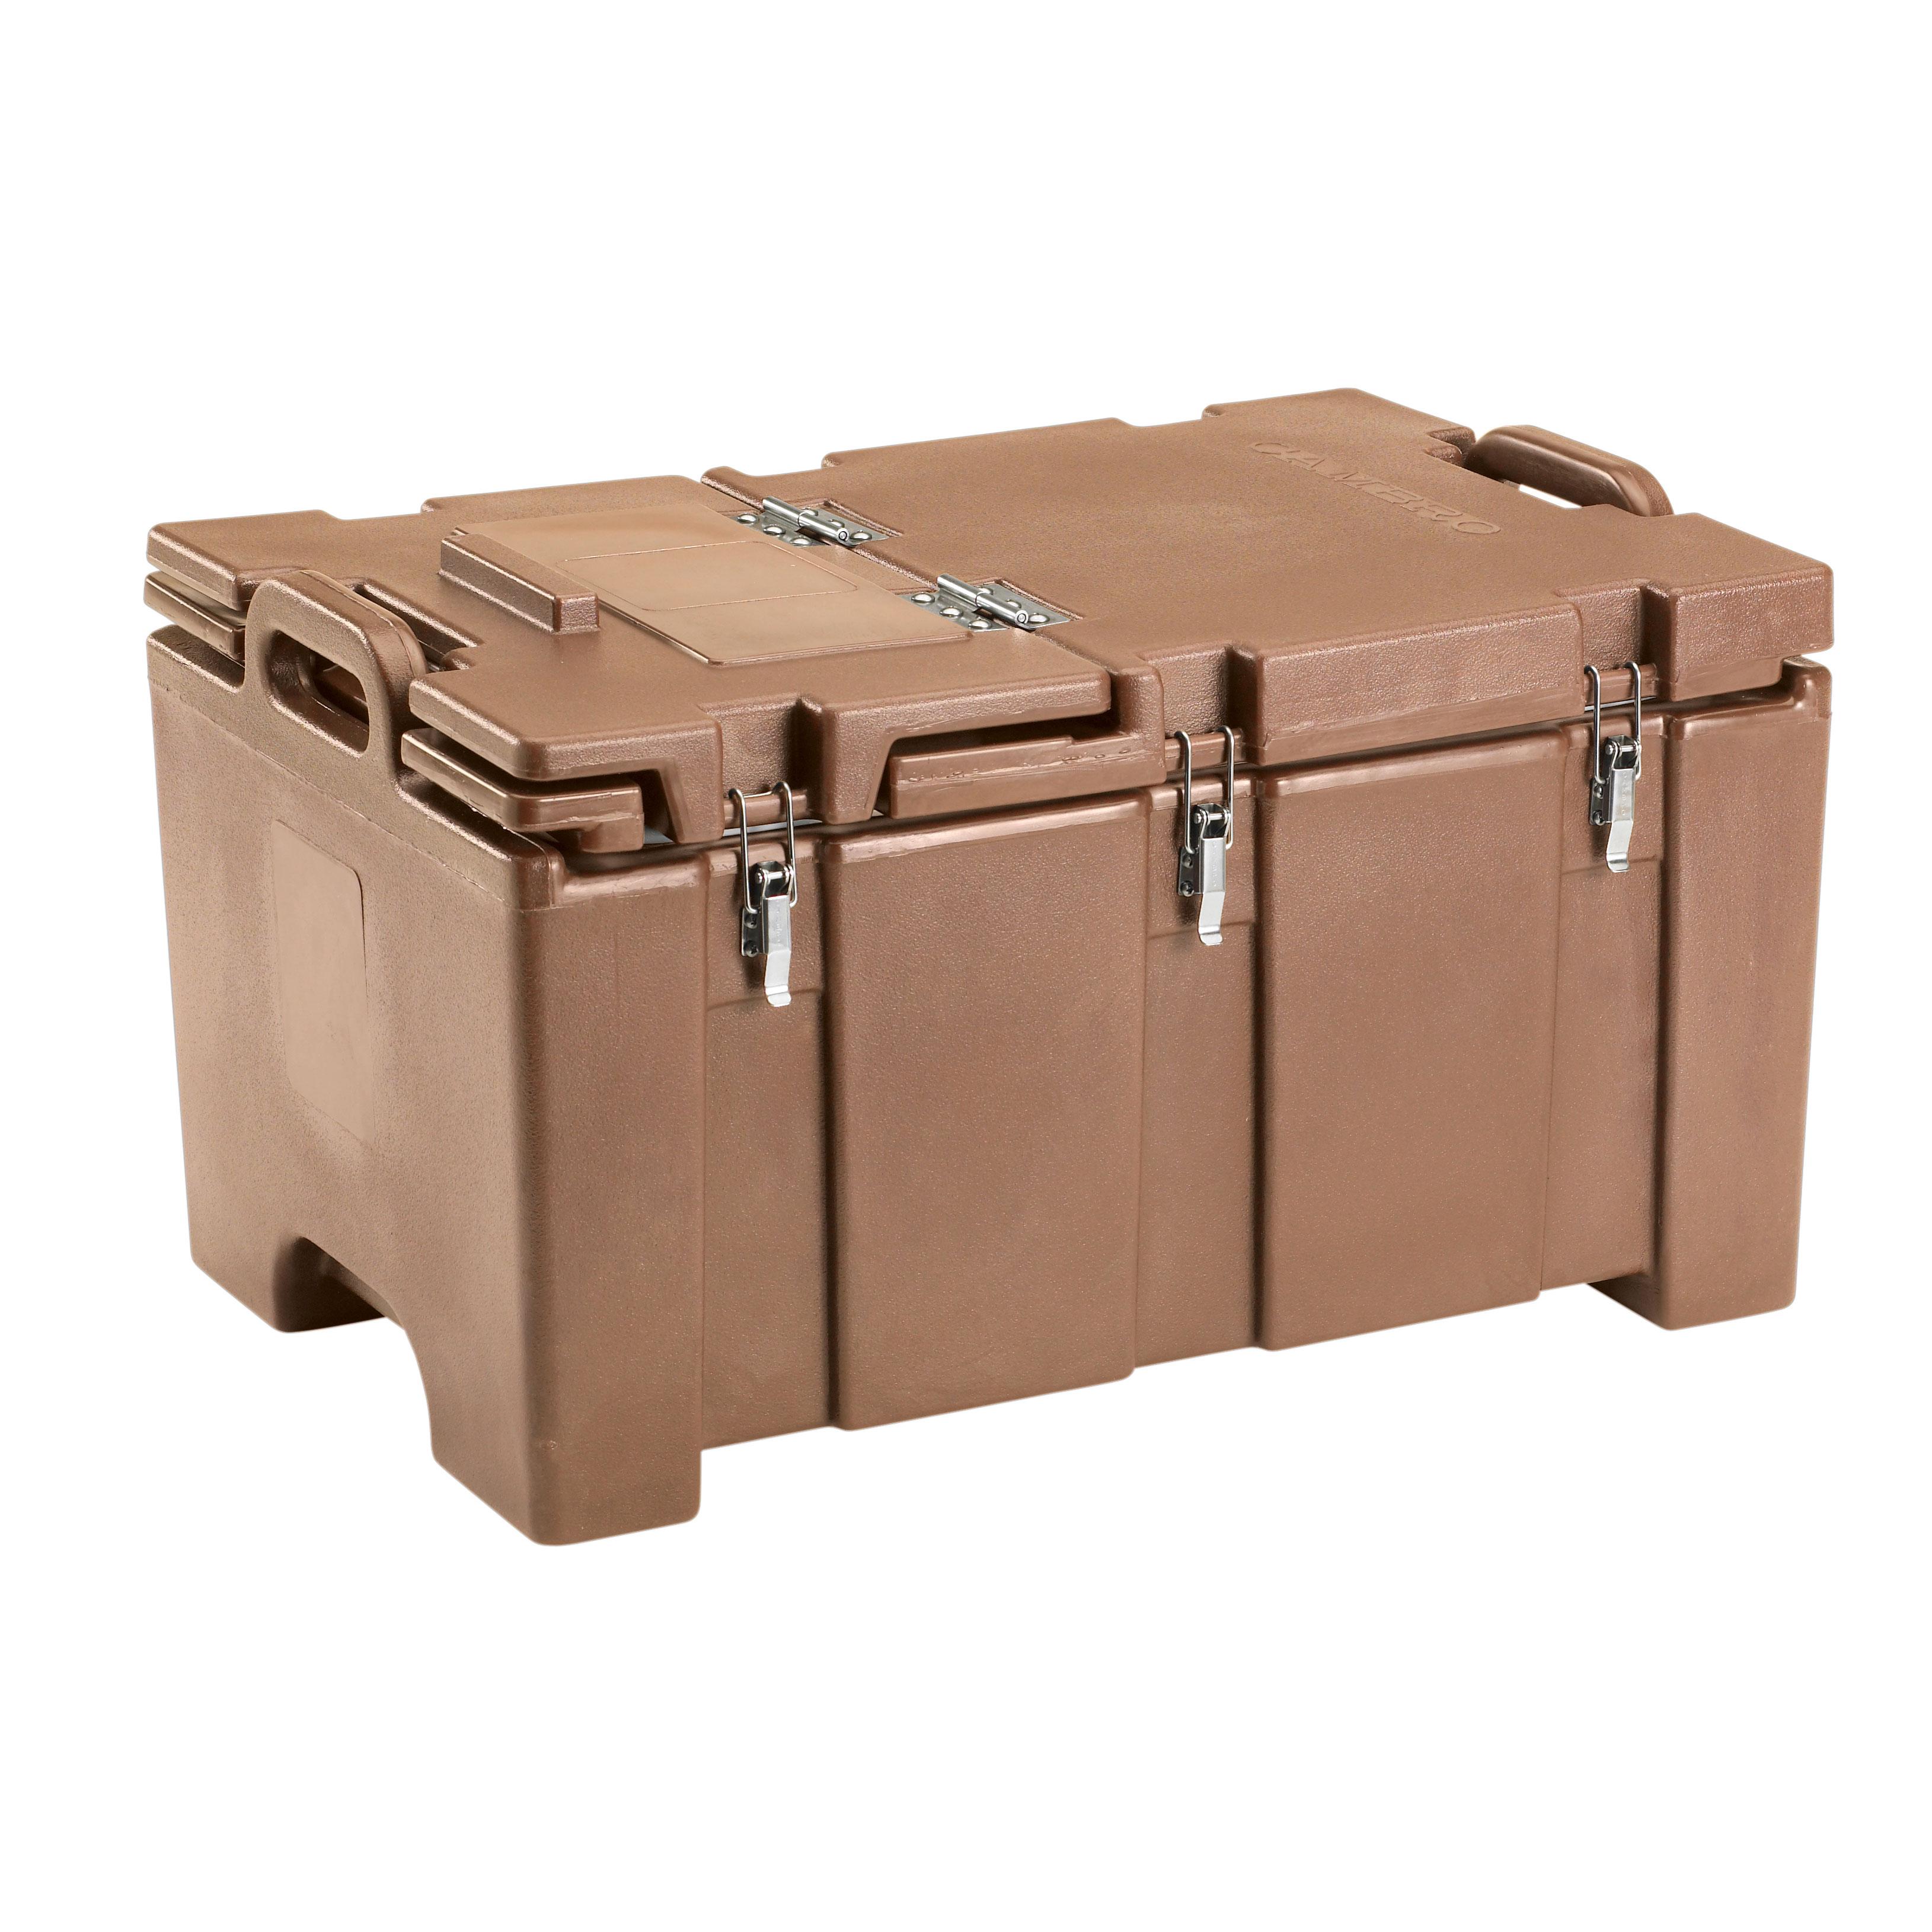 Cambro 100MPCHL157 insulated food storage